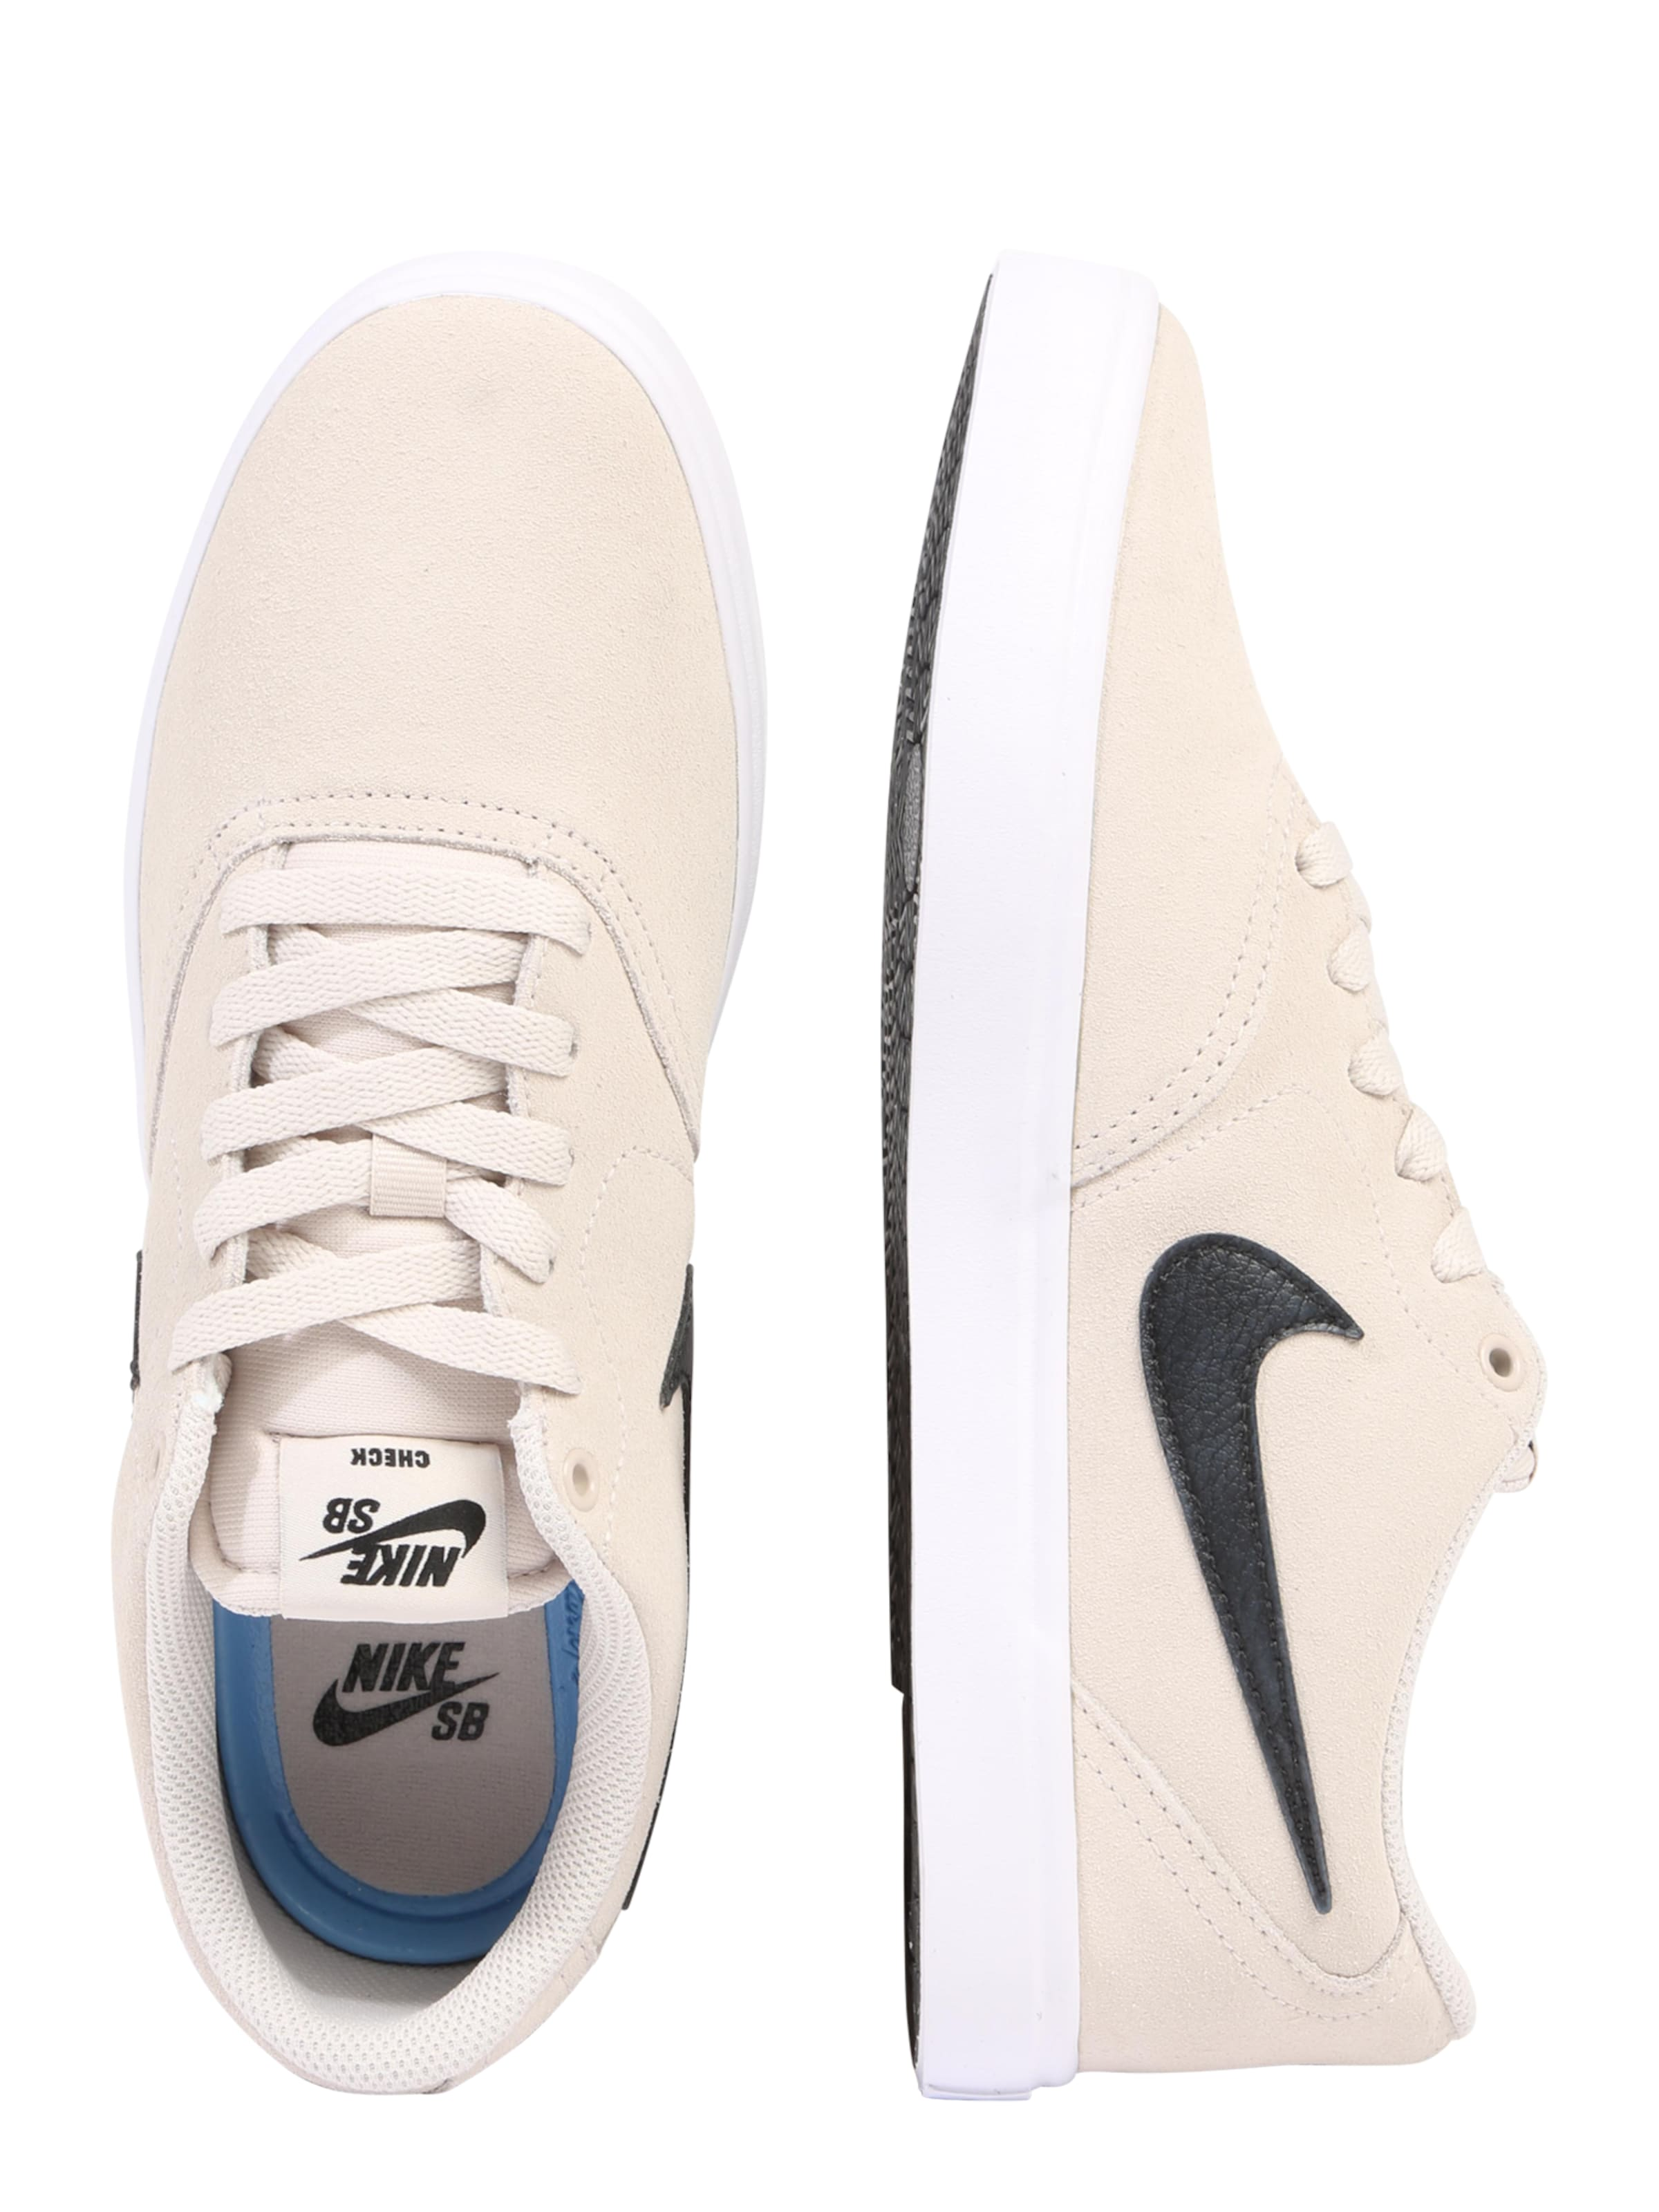 Solar' 'check Sneaker Weiß Sb Nike In SandSchwarz VpGMqUzS